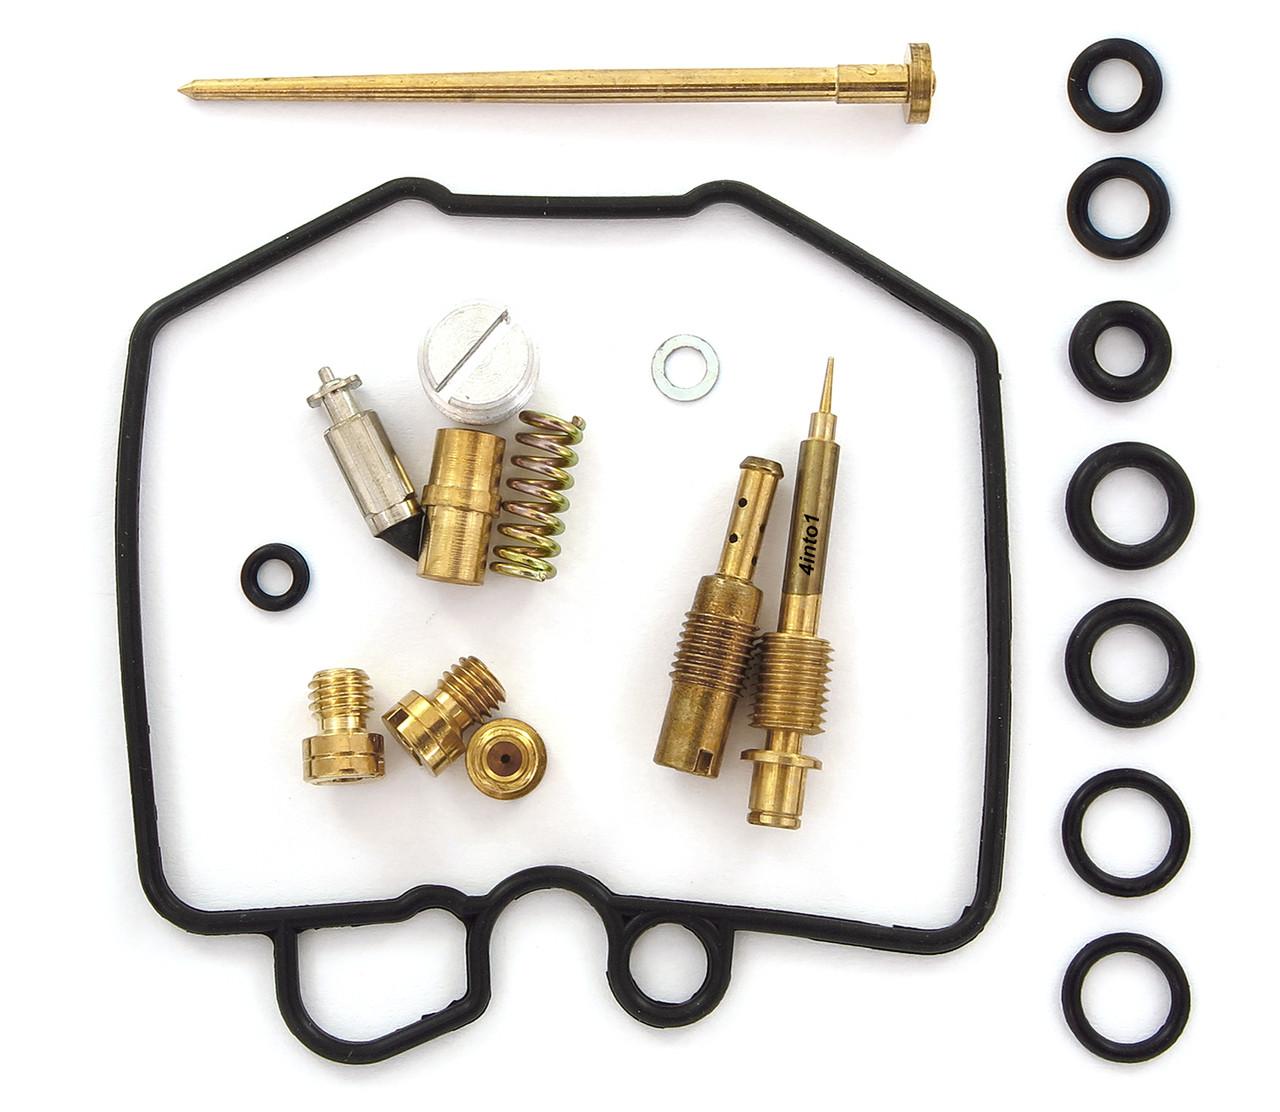 Deluxe Carburetor Rebuild Kit With Floats 1983-1986 Honda CB450SC Nighthawk